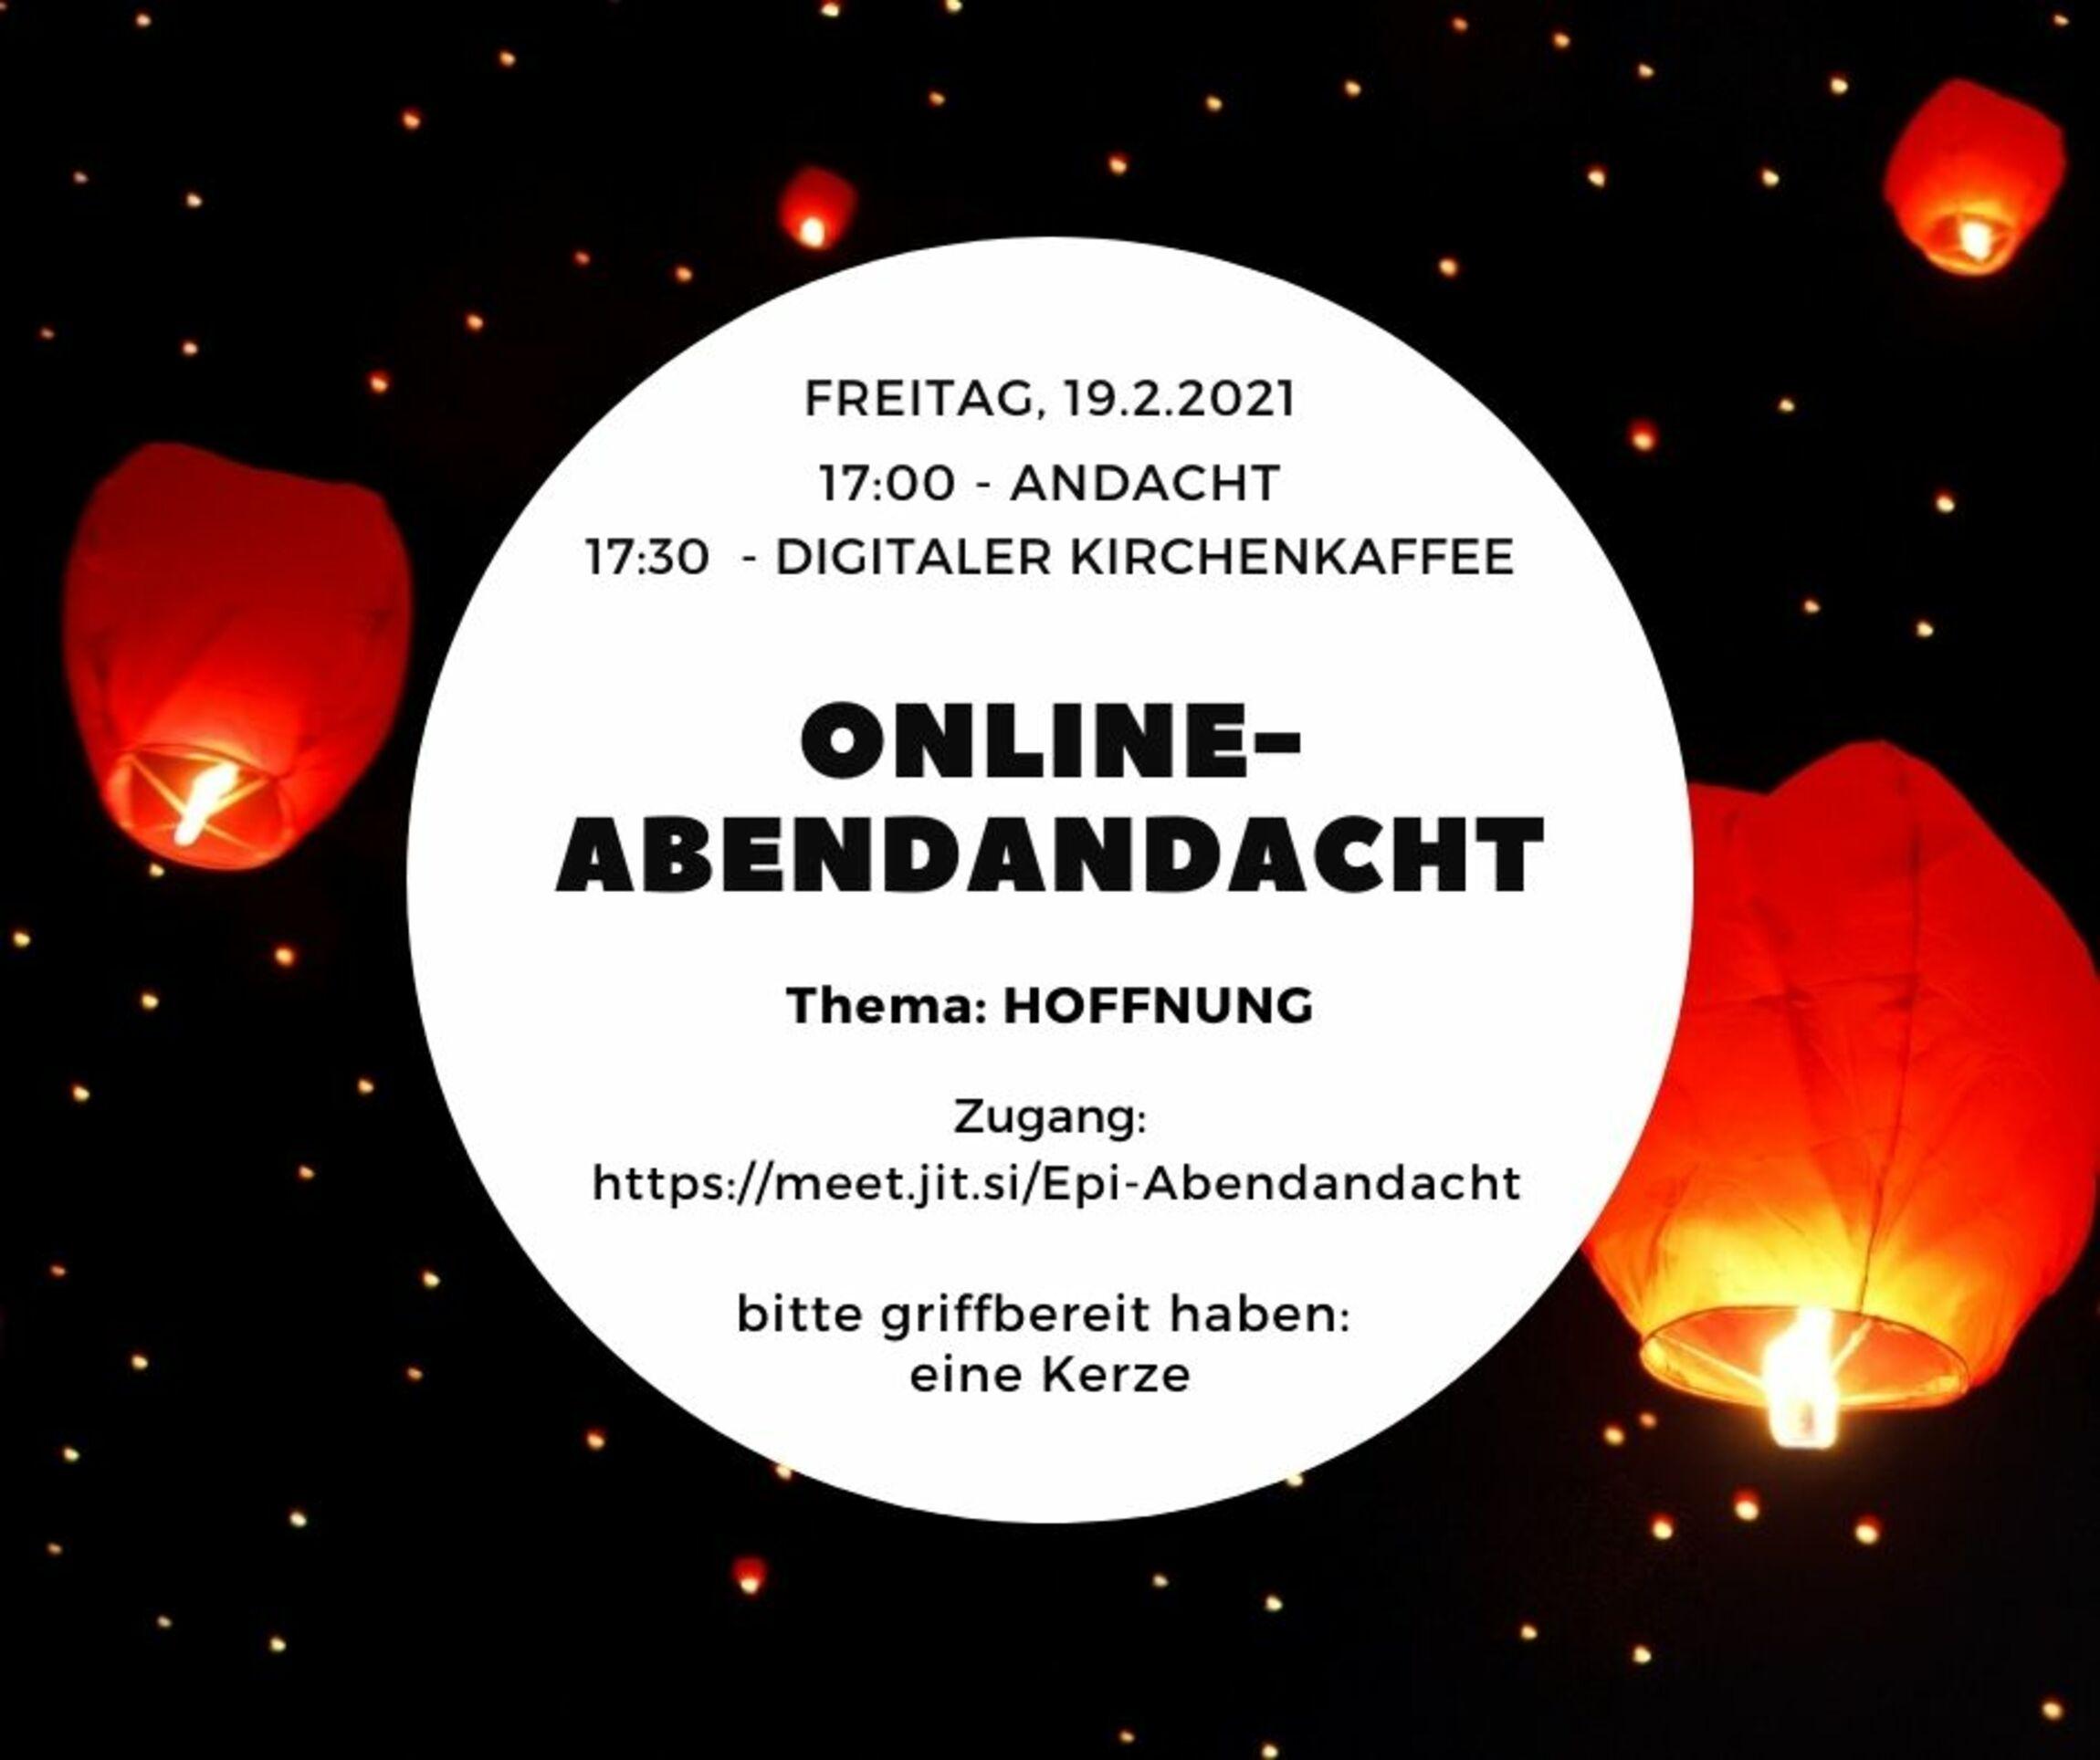 Online-Abendandacht-Epiphanias-Kirchengemeinde